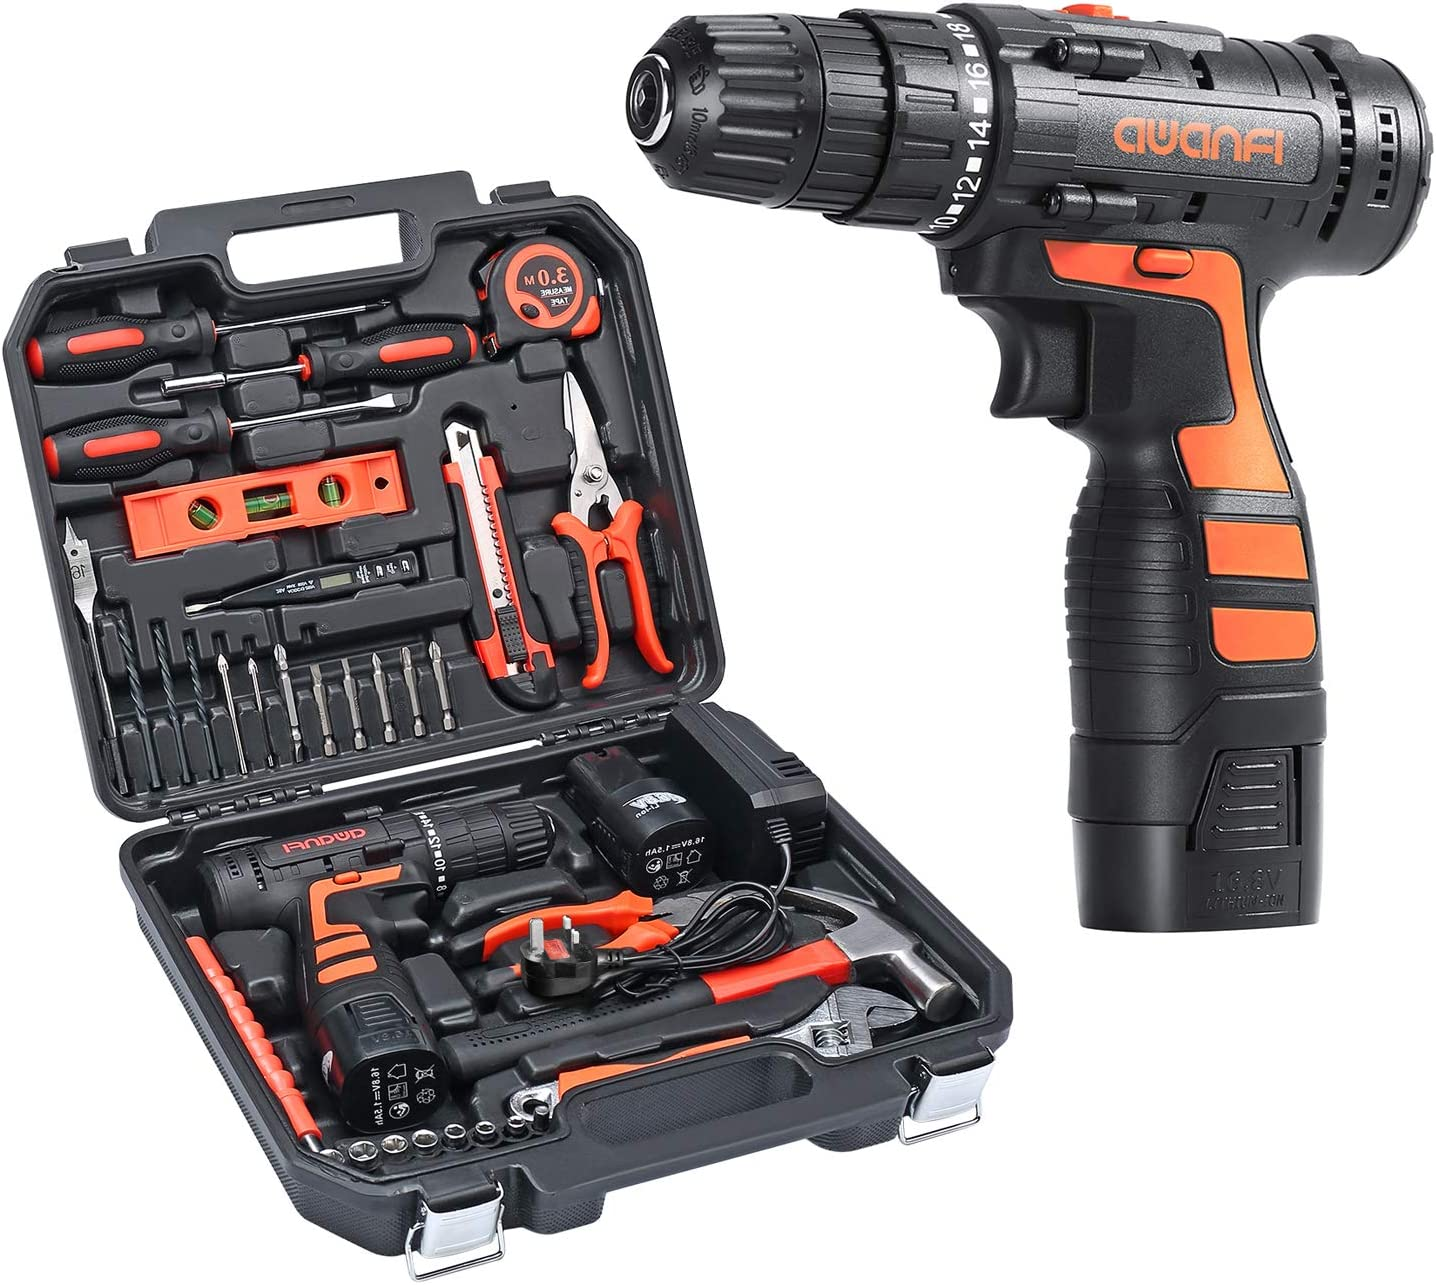 AWANFI Werkzeugkoffer mit Akkuschrauber 35PCs Handwerkzeuge Kit mit Bohrschrauber Werkzeugset 16.8 V 1500 mAh 2 Li-ion Akkus